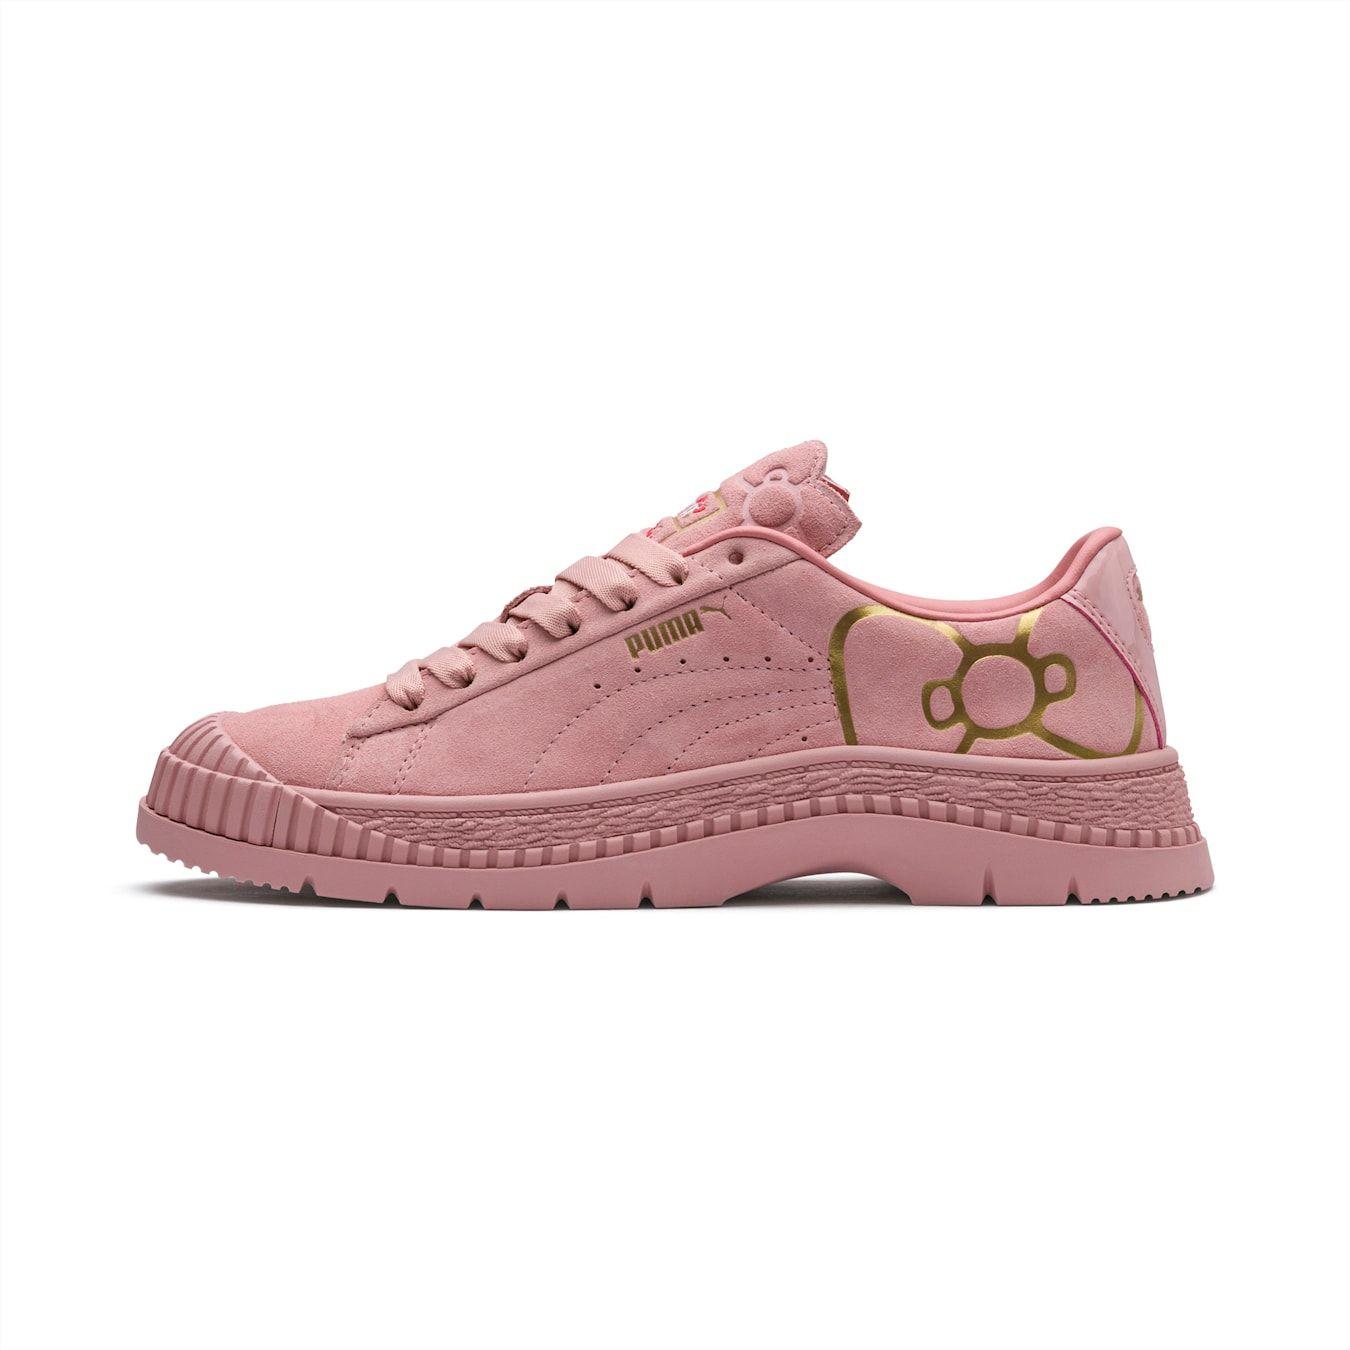 PUMA x HELLO KITTY Utility Women's Sneakers PUMA US in